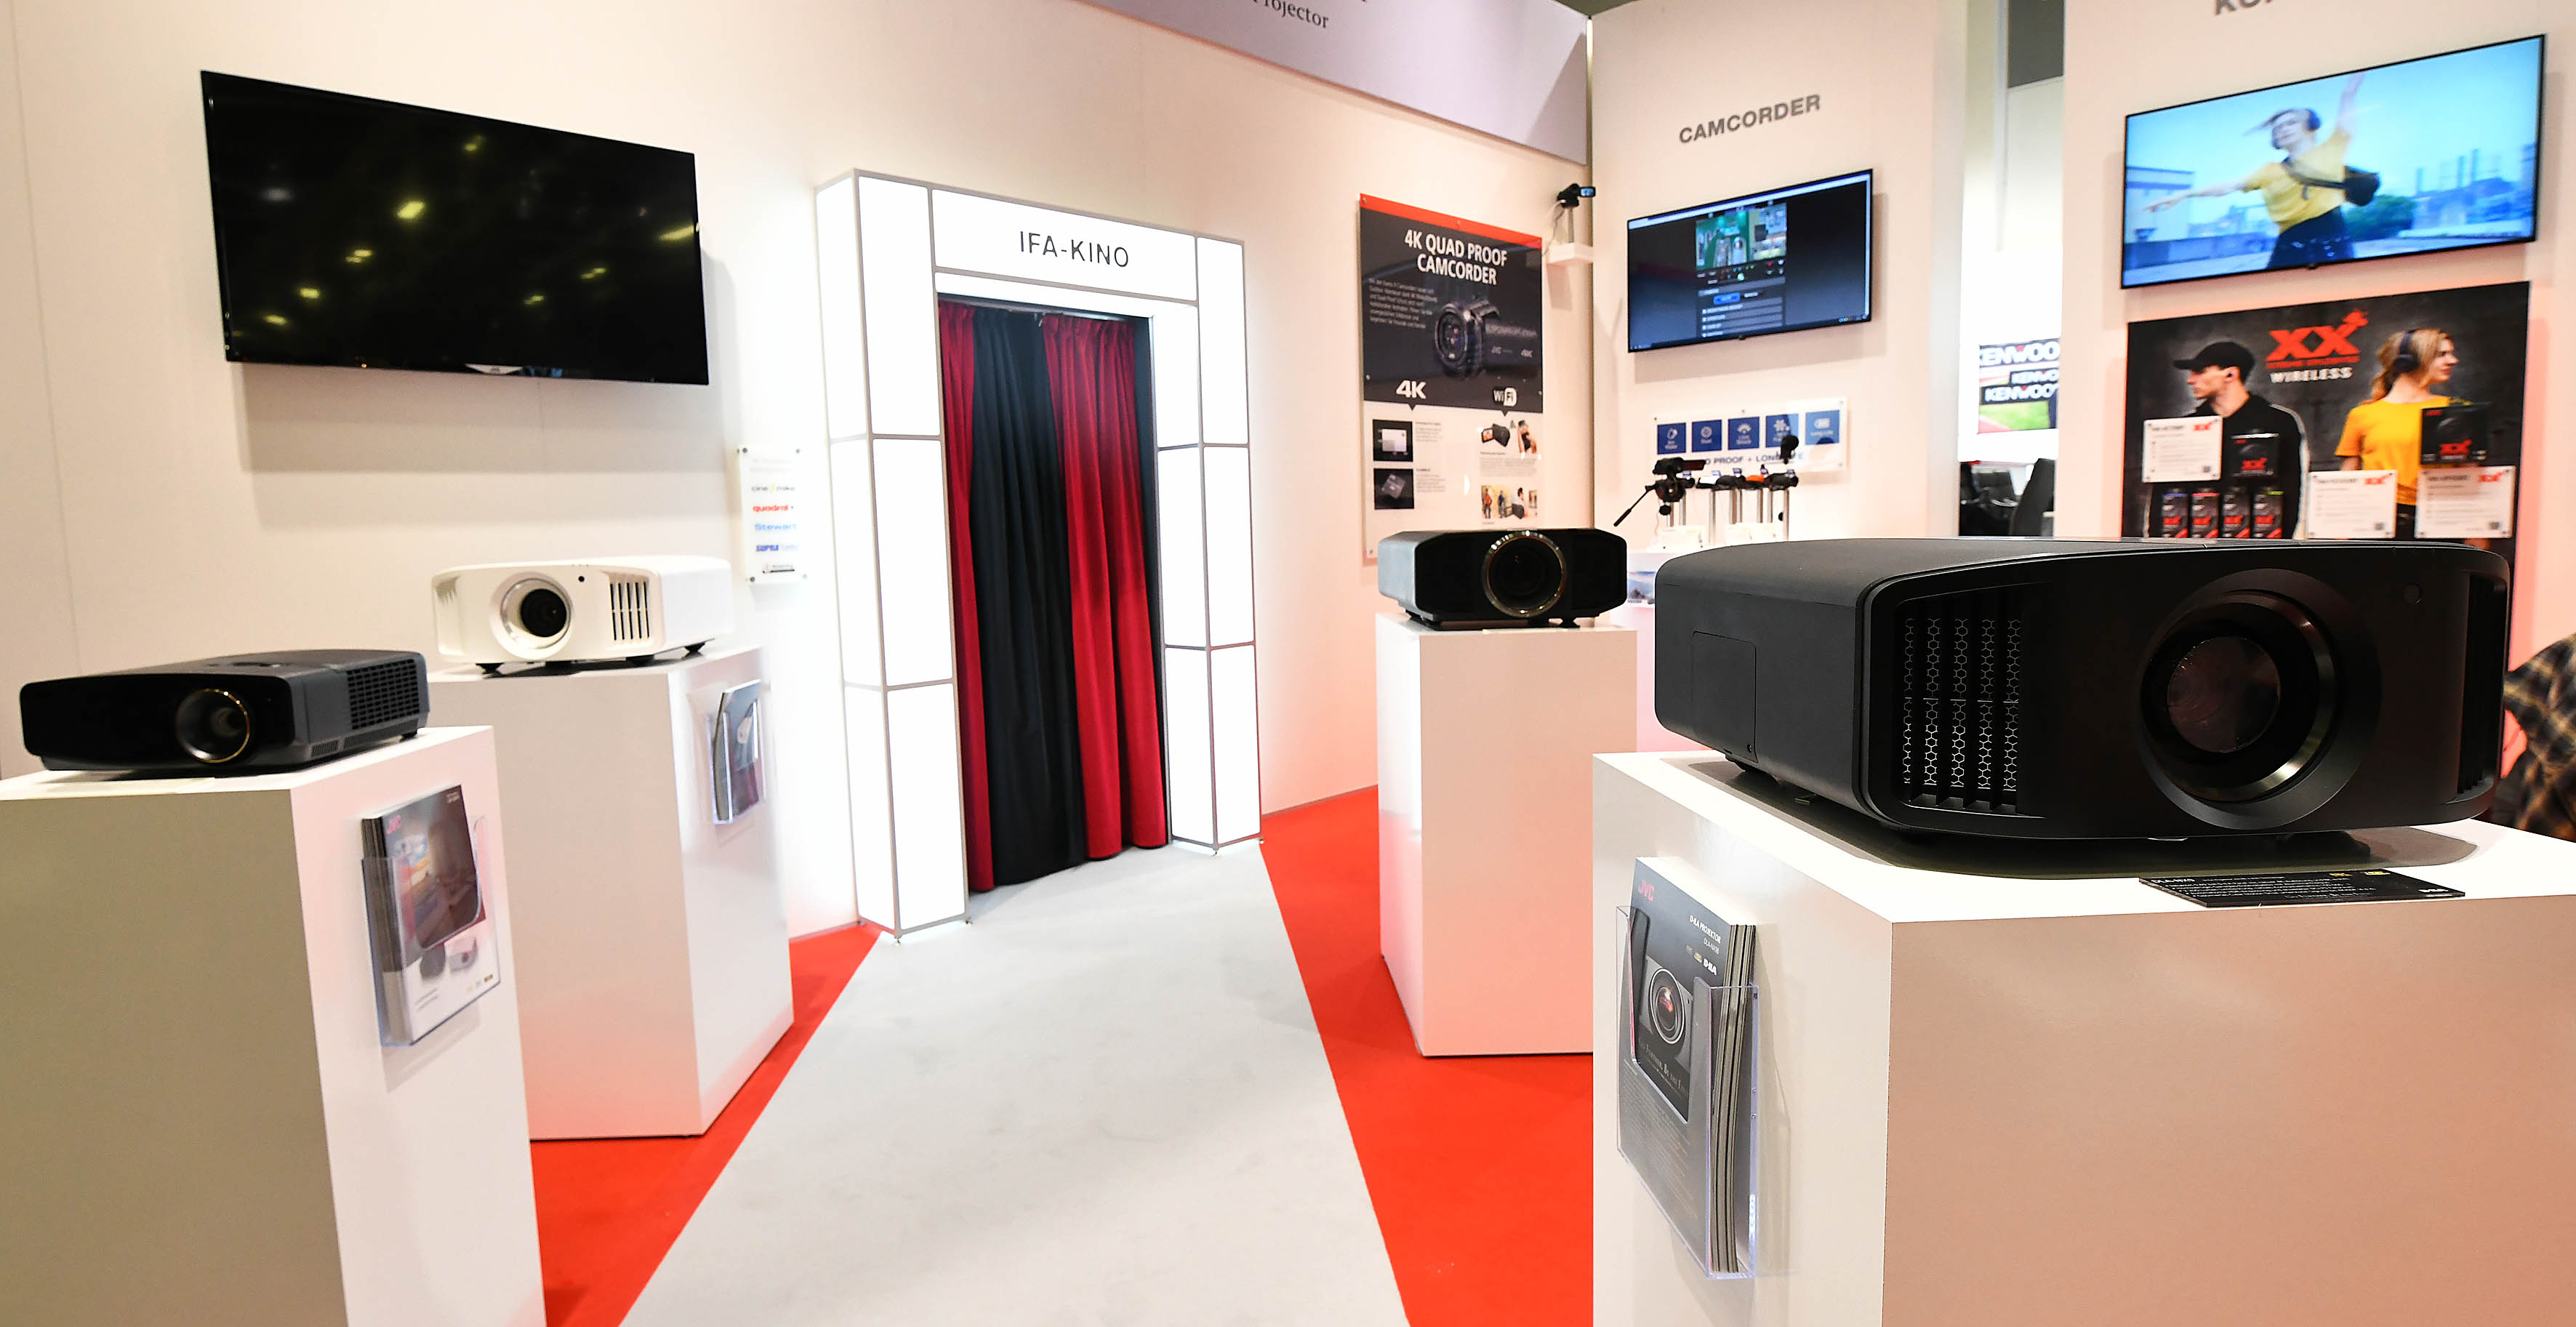 Foto: Michael B. Rehders Weltpremiere: JVC präsentiert seinen neuen 8K-Projektor mit eShift-Technologie.